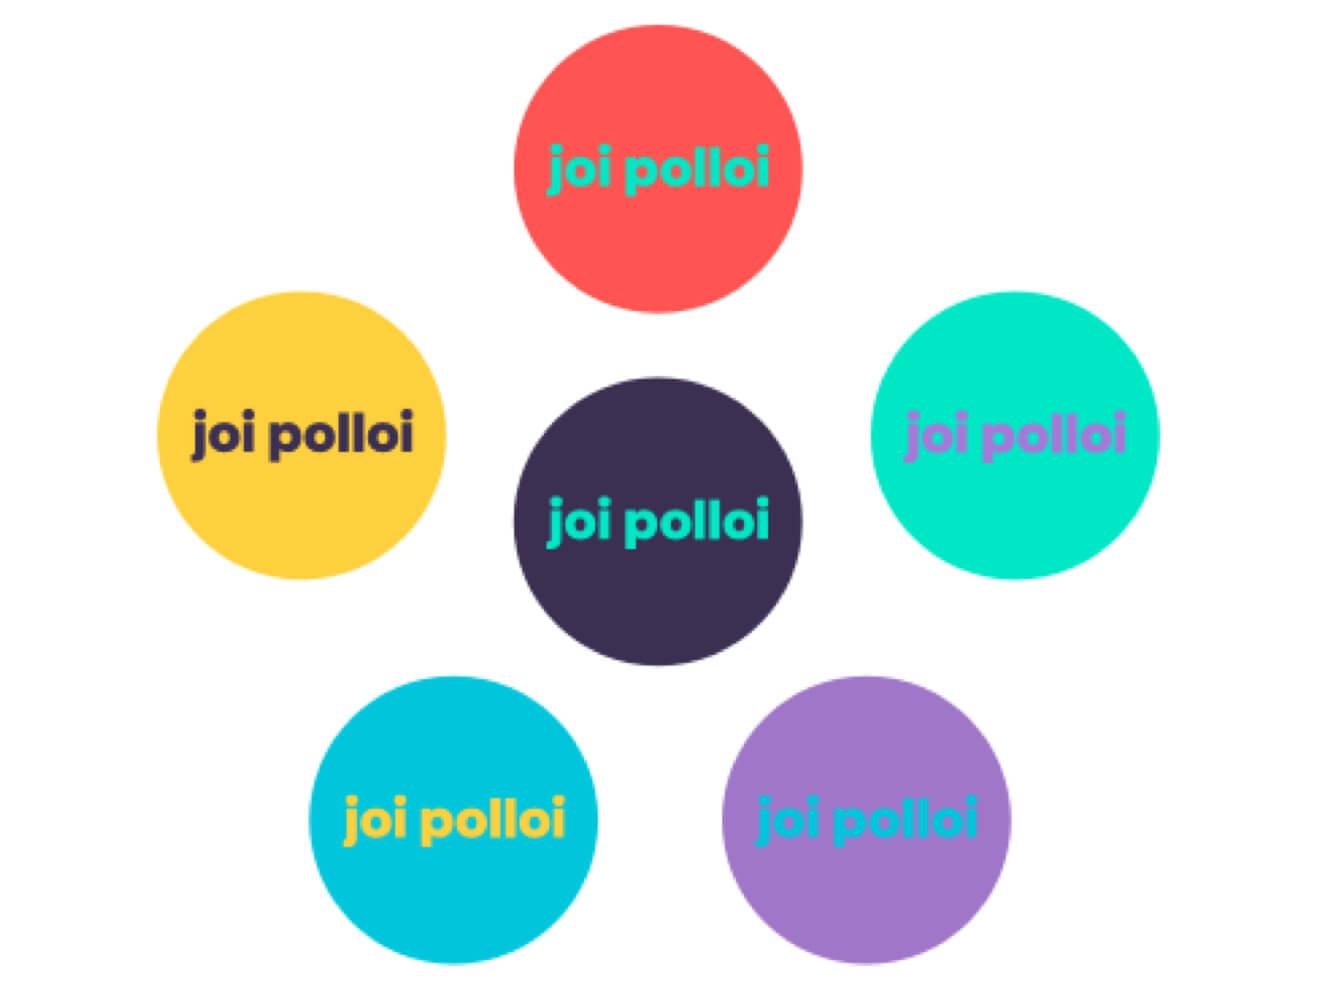 http://joipolloi.com/wp-content/uploads/2016/11/work-page-link-copy-5.jpg